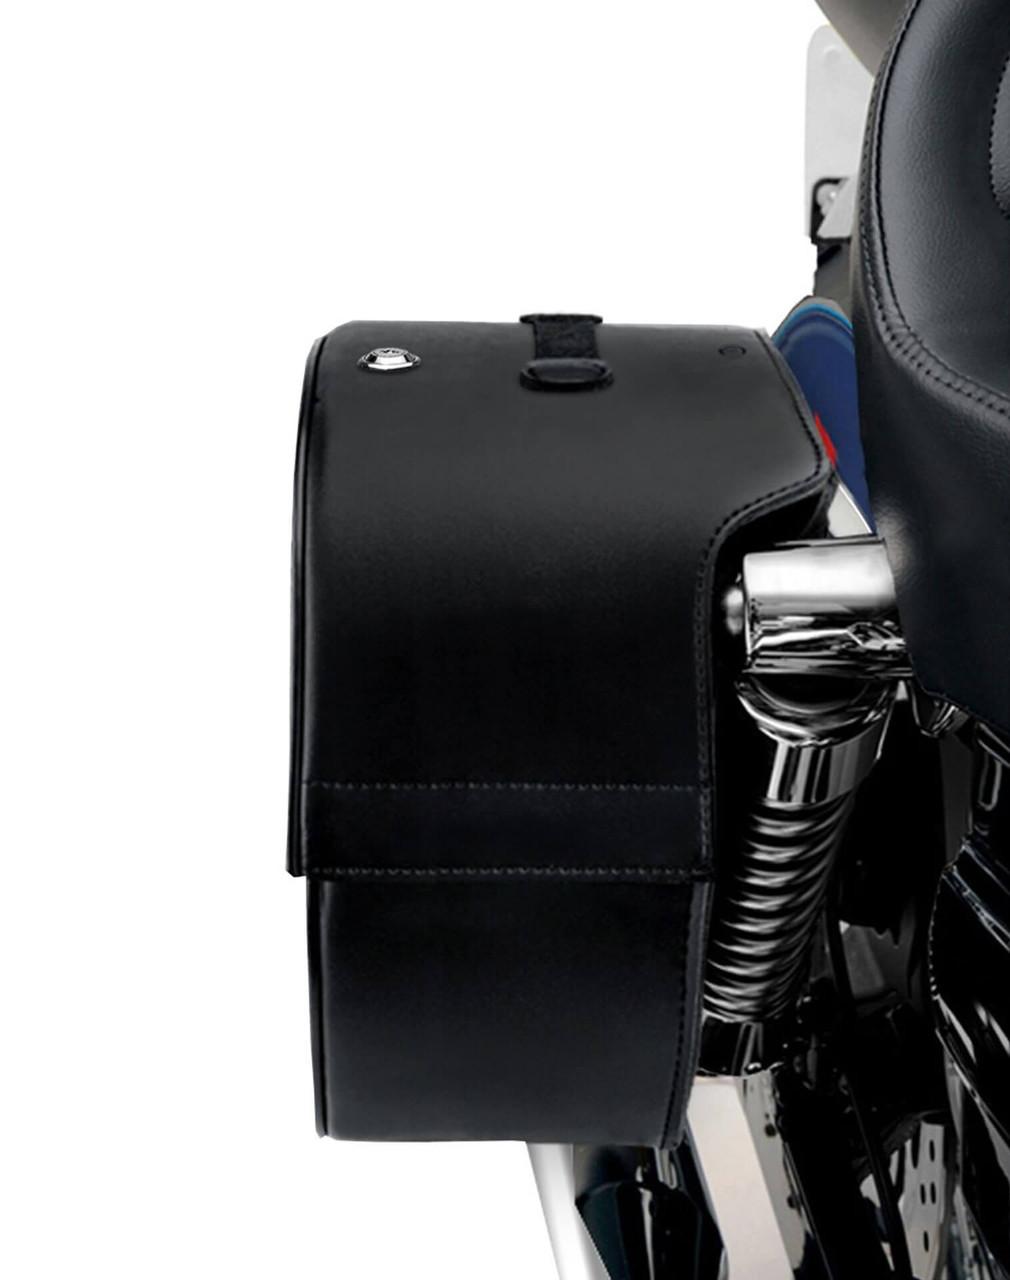 Honda 1100 Shadow Aero Viking Spear Studded Shock Cutout Large Leather Motorcycle Saddlebags Shock Cutout View